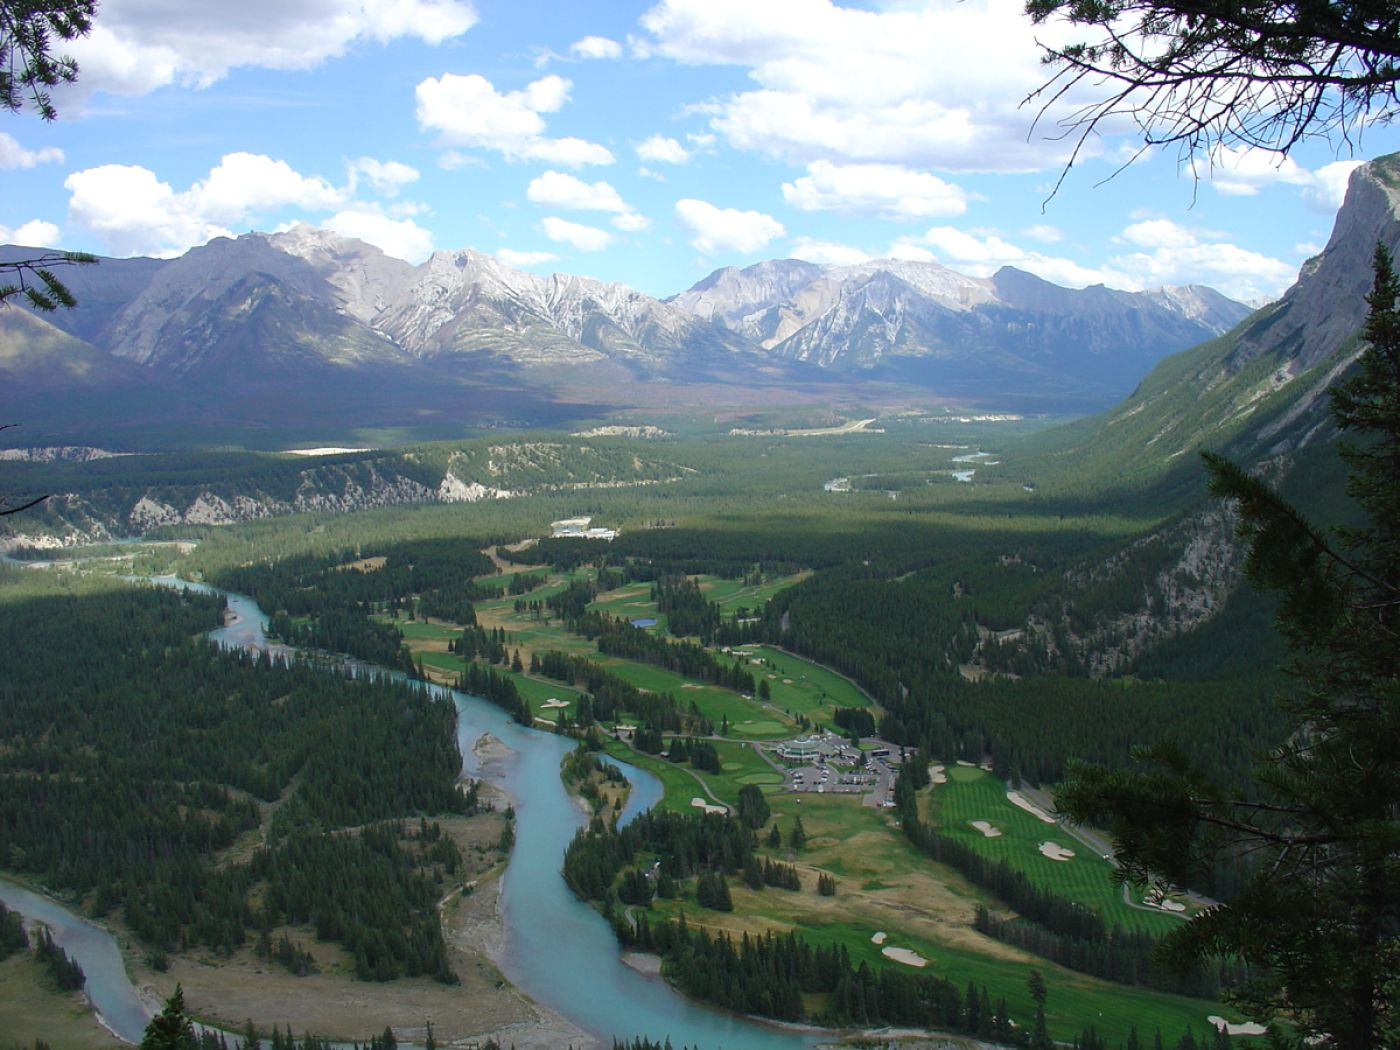 Alberta alberta canada guided tours banff national park alberta canadazoom imagealberta